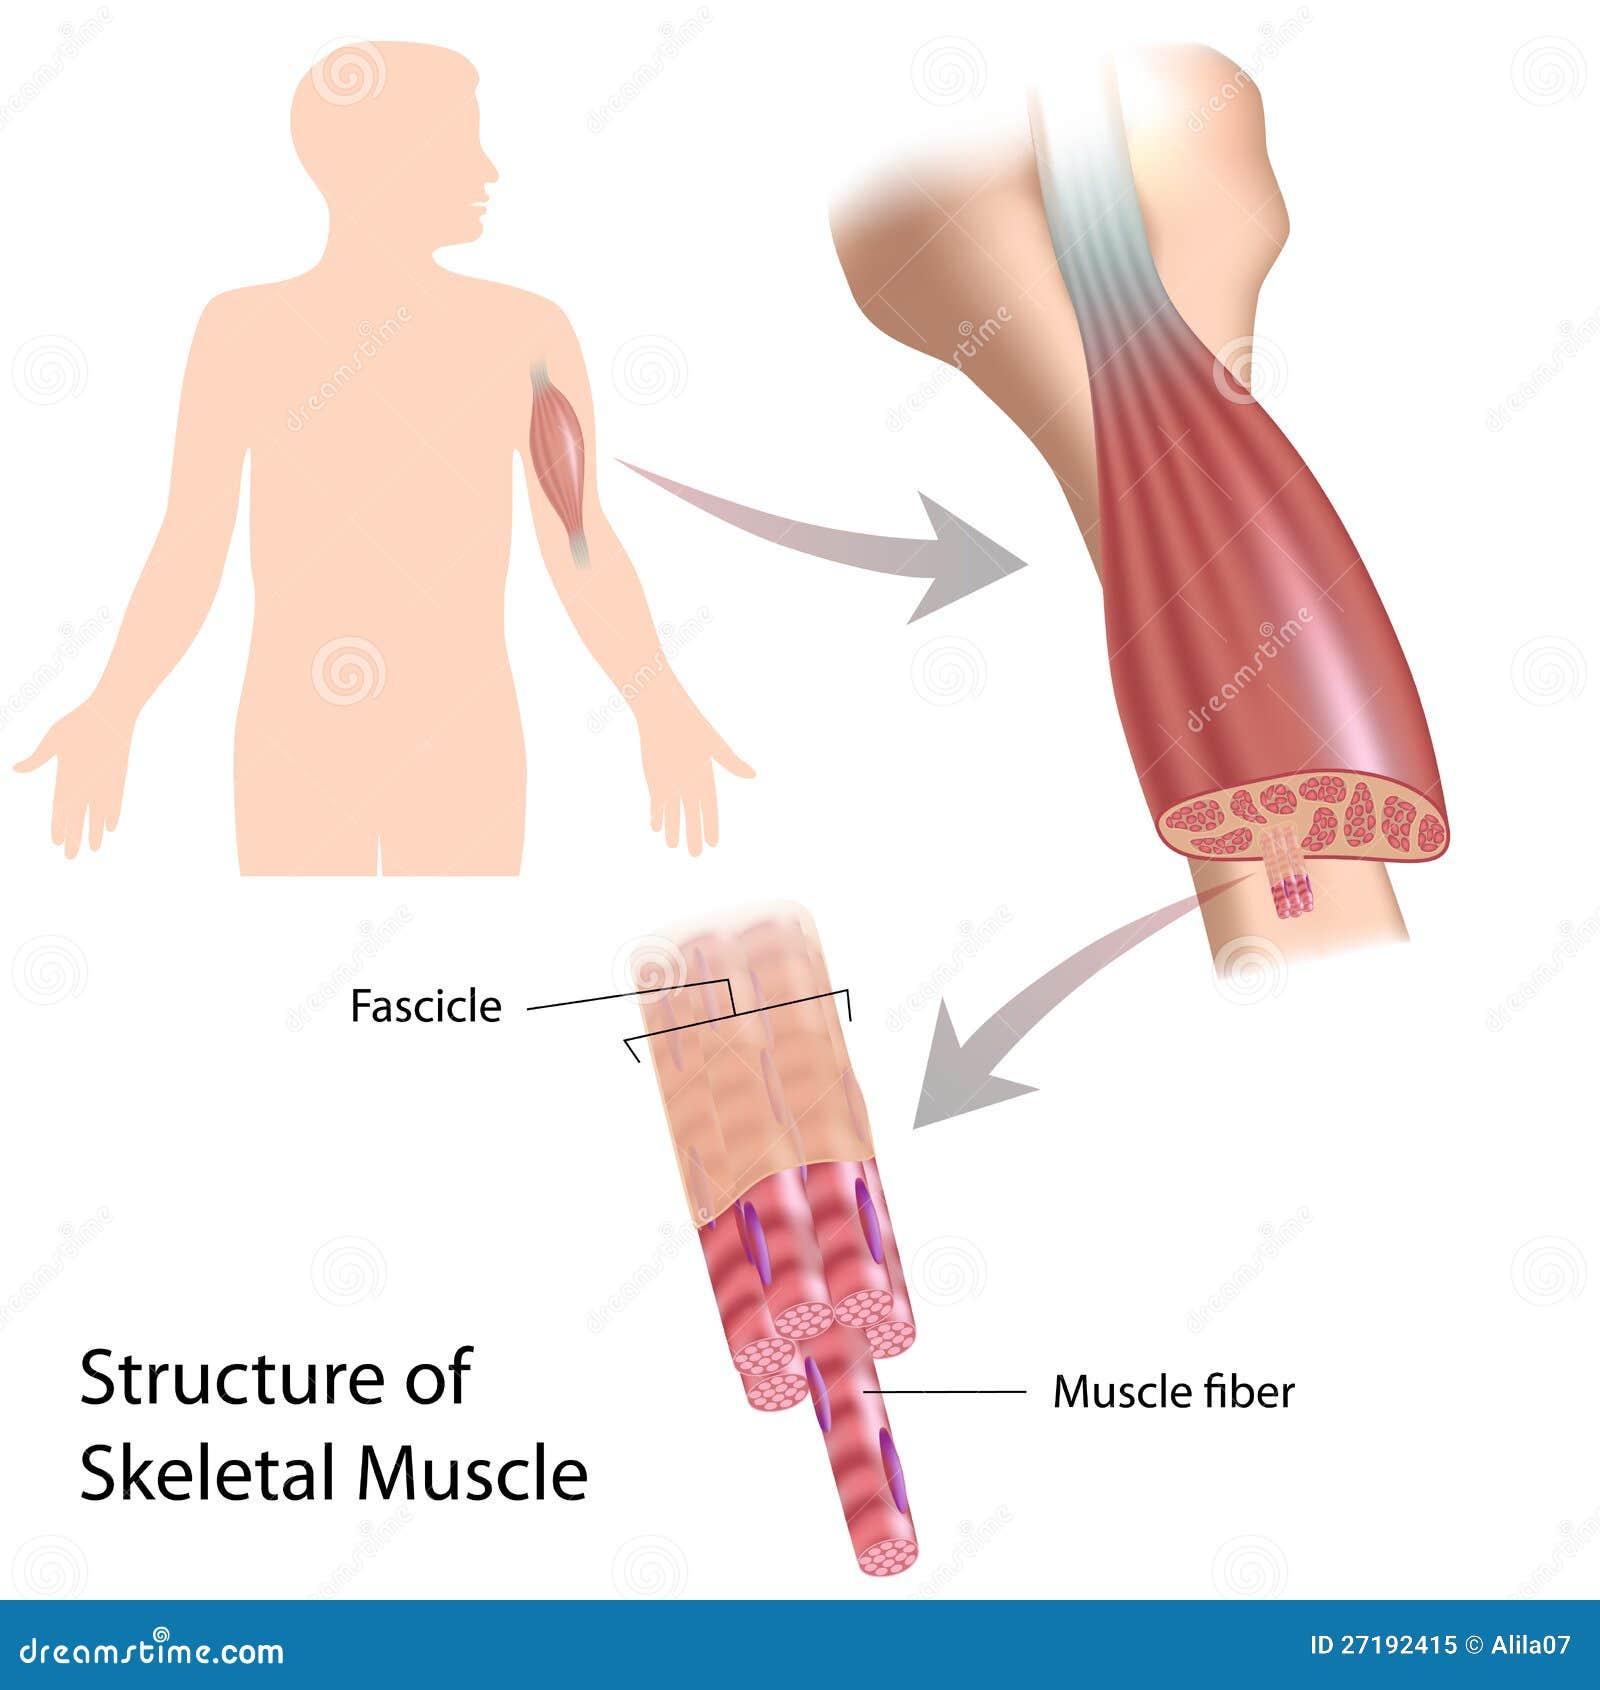 Structure Of Skeletal Muscle Fiber Stock Vector Illustration Of